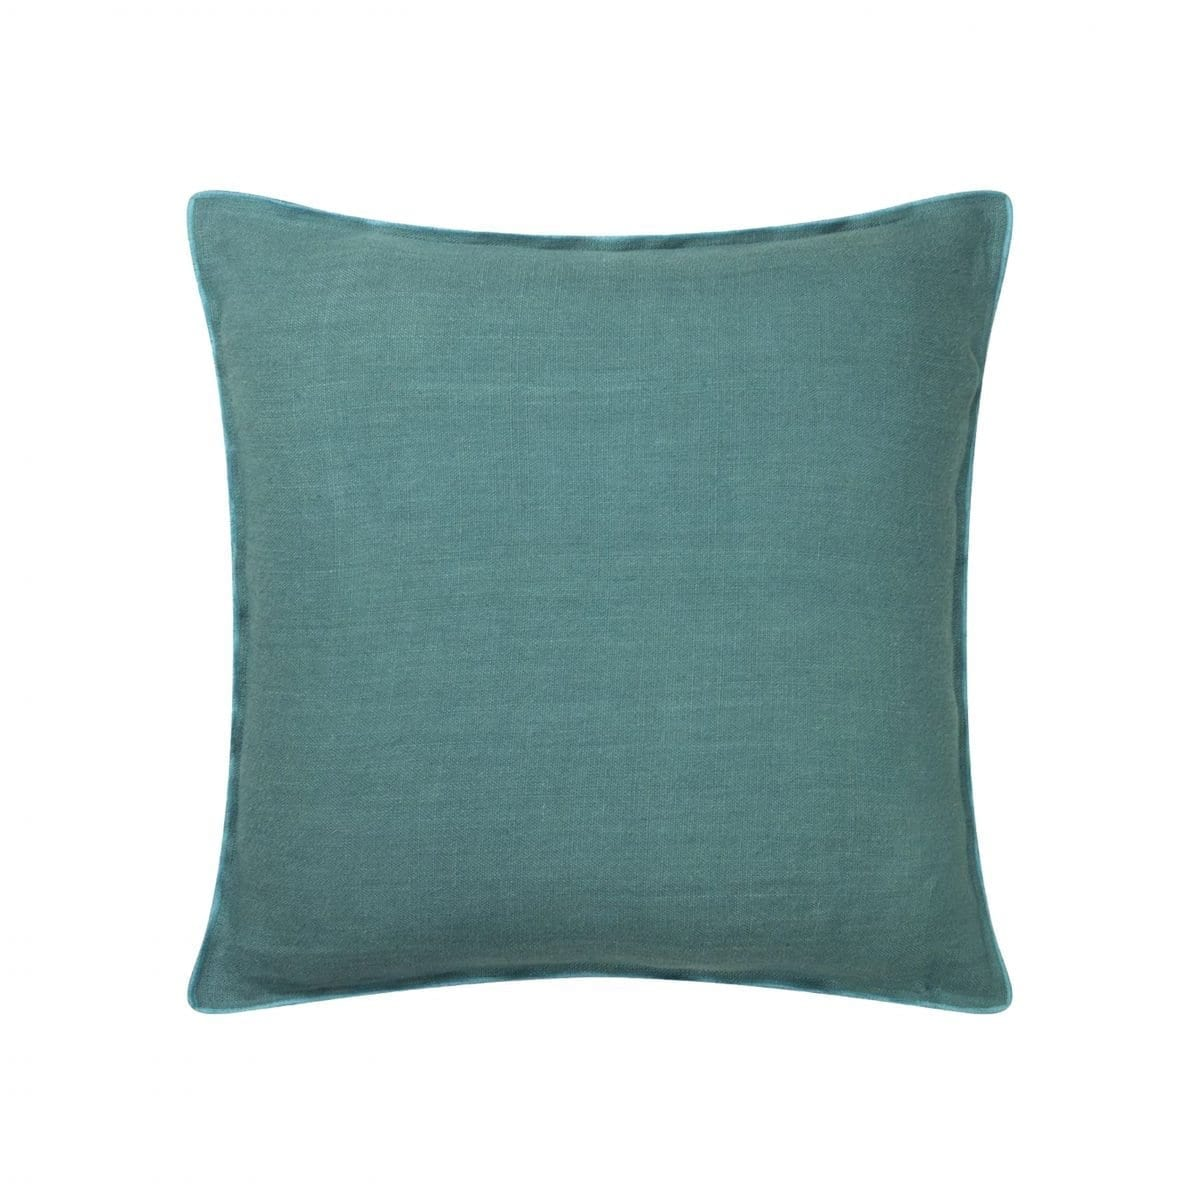 Tweekleurig modern kussen Brera lino ocean van Designers Guild